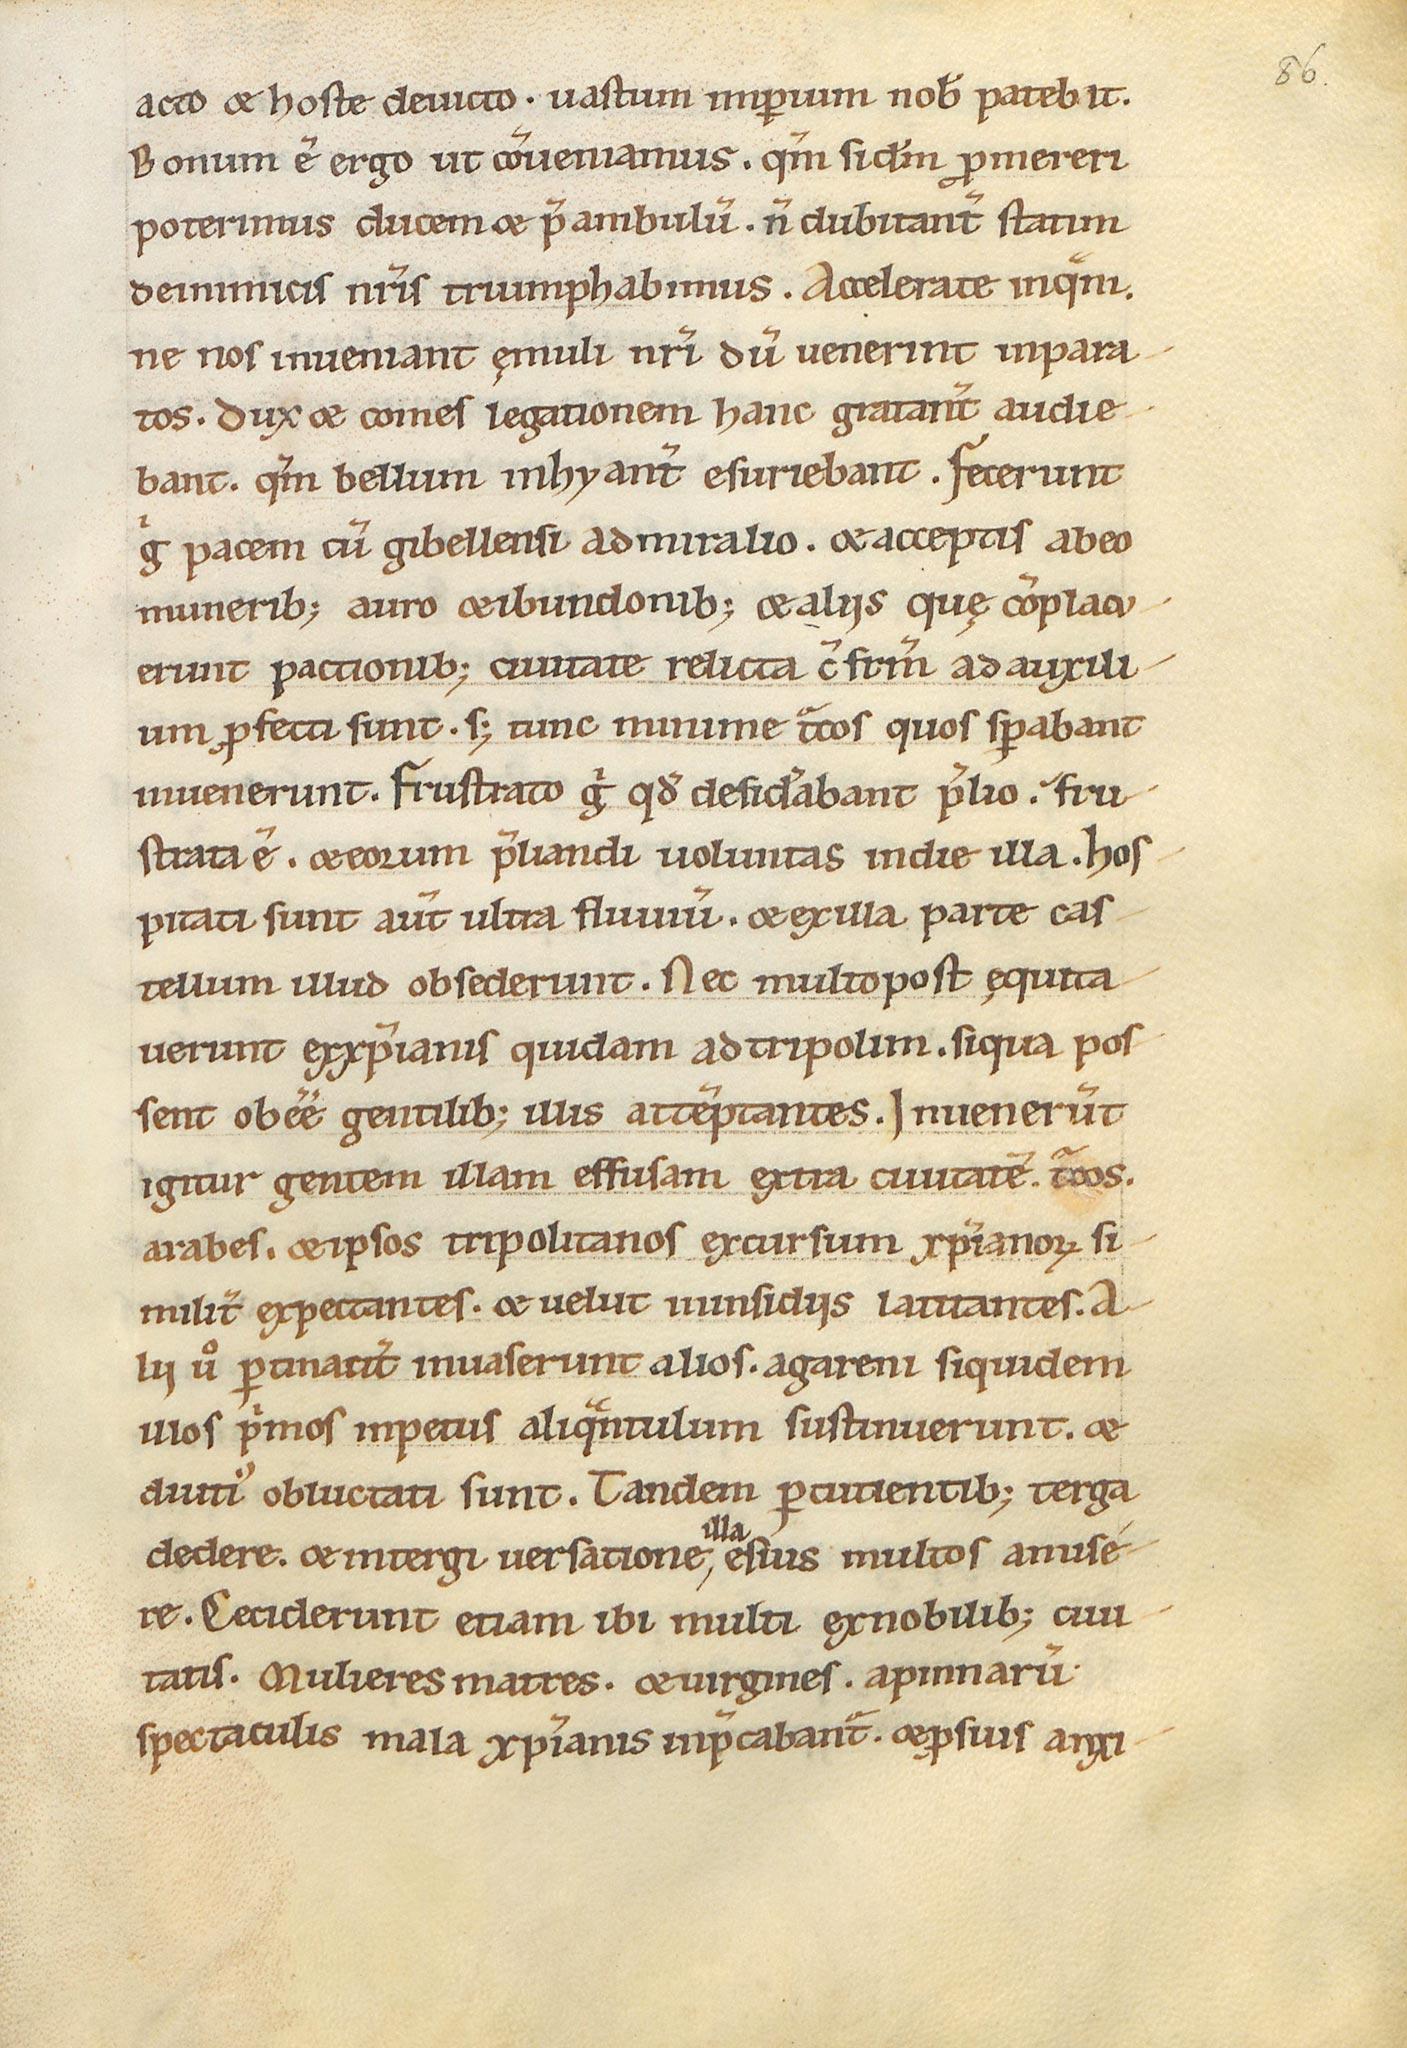 Manuscrit-Historia-Hierosolimitana-86r°